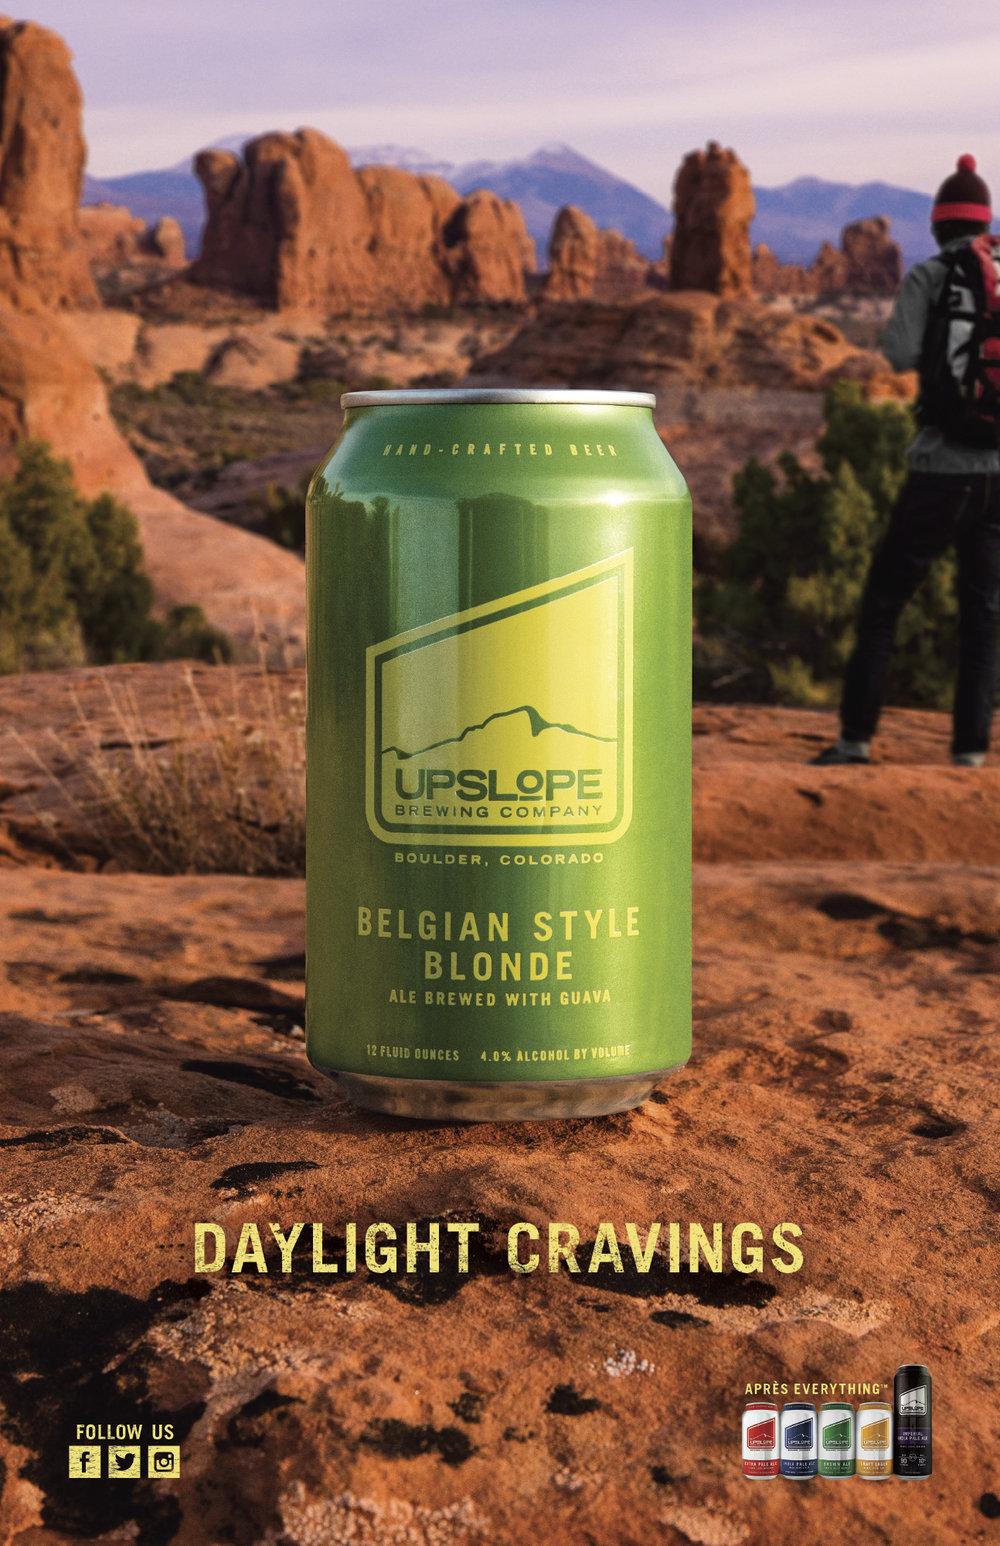 DaylightCravings_Poster.jpg